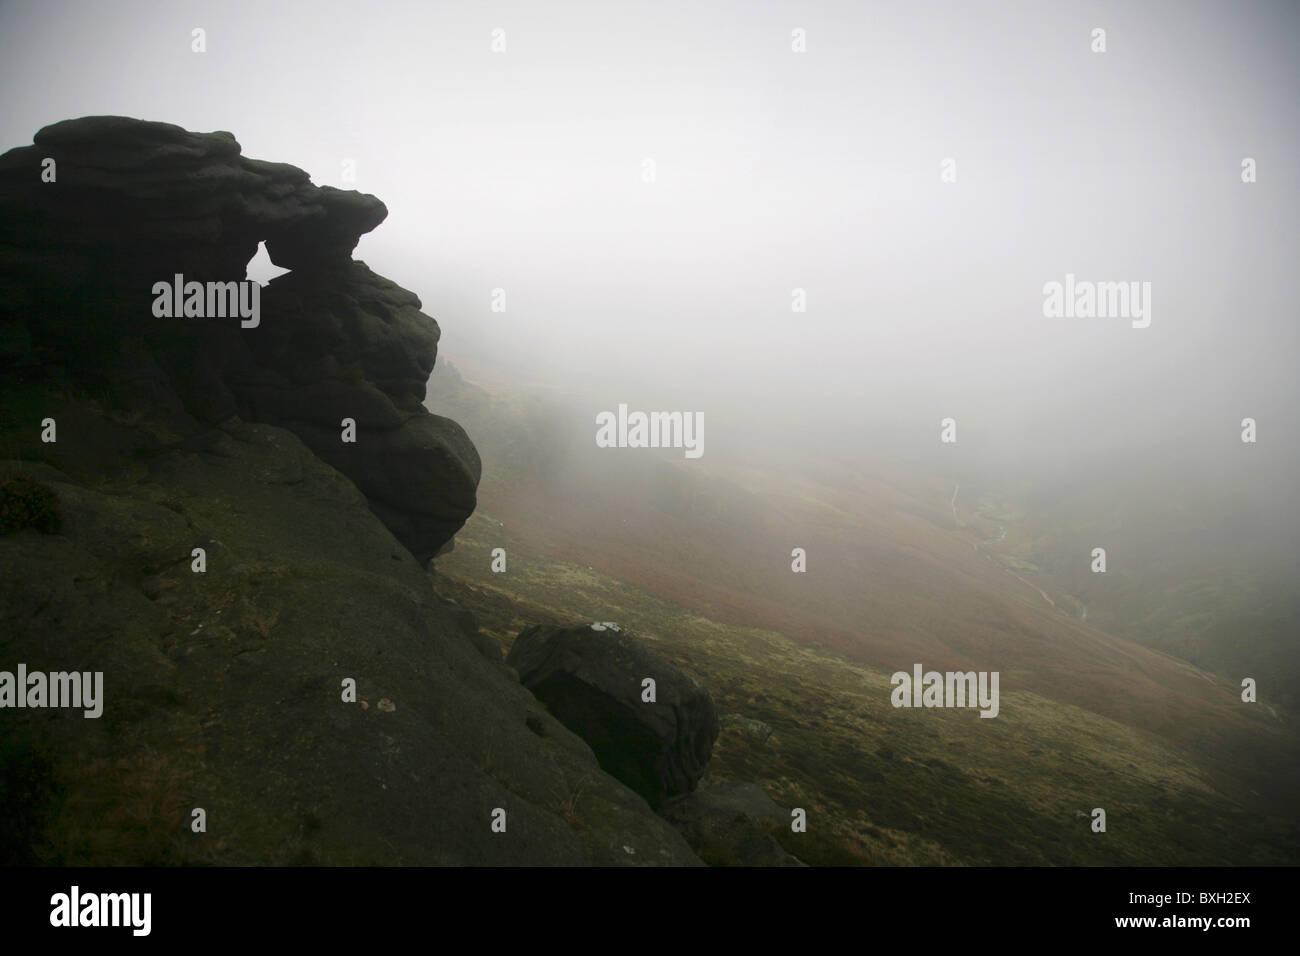 Rock formation on the upper slopes of Kinder Scout. Peak District, England. - Stock Image